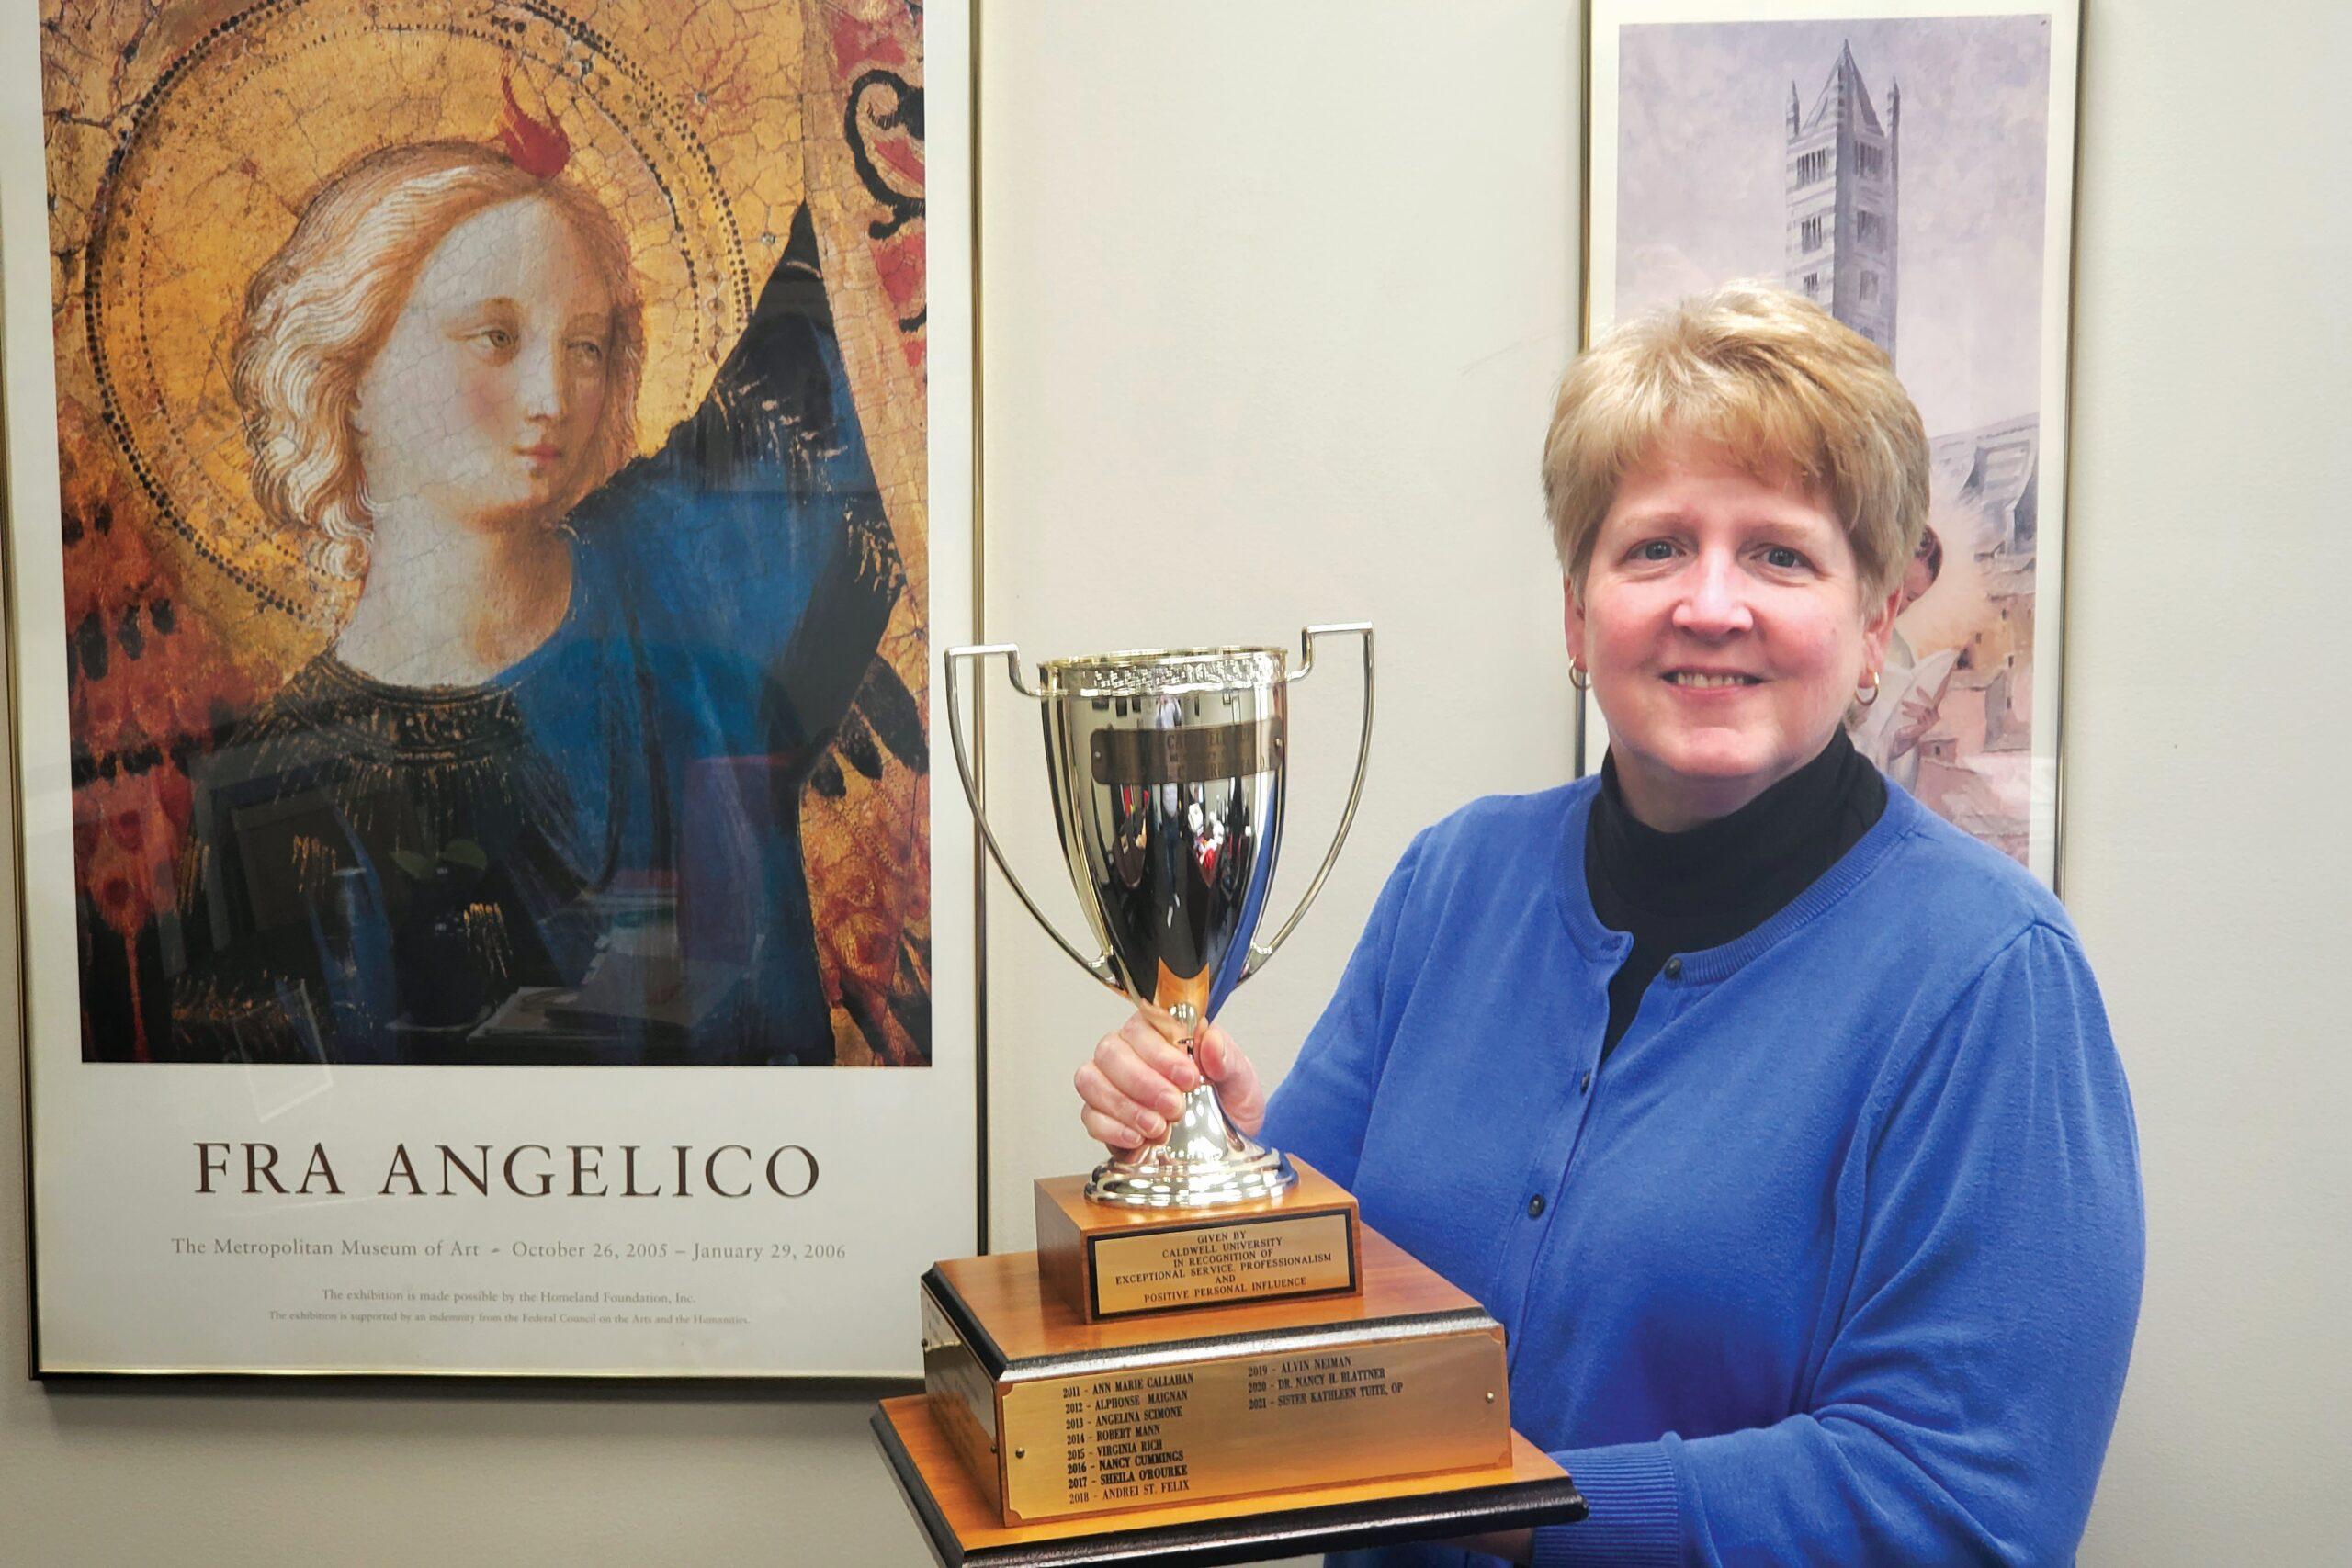 Sister Kathleen Caldwell Cup